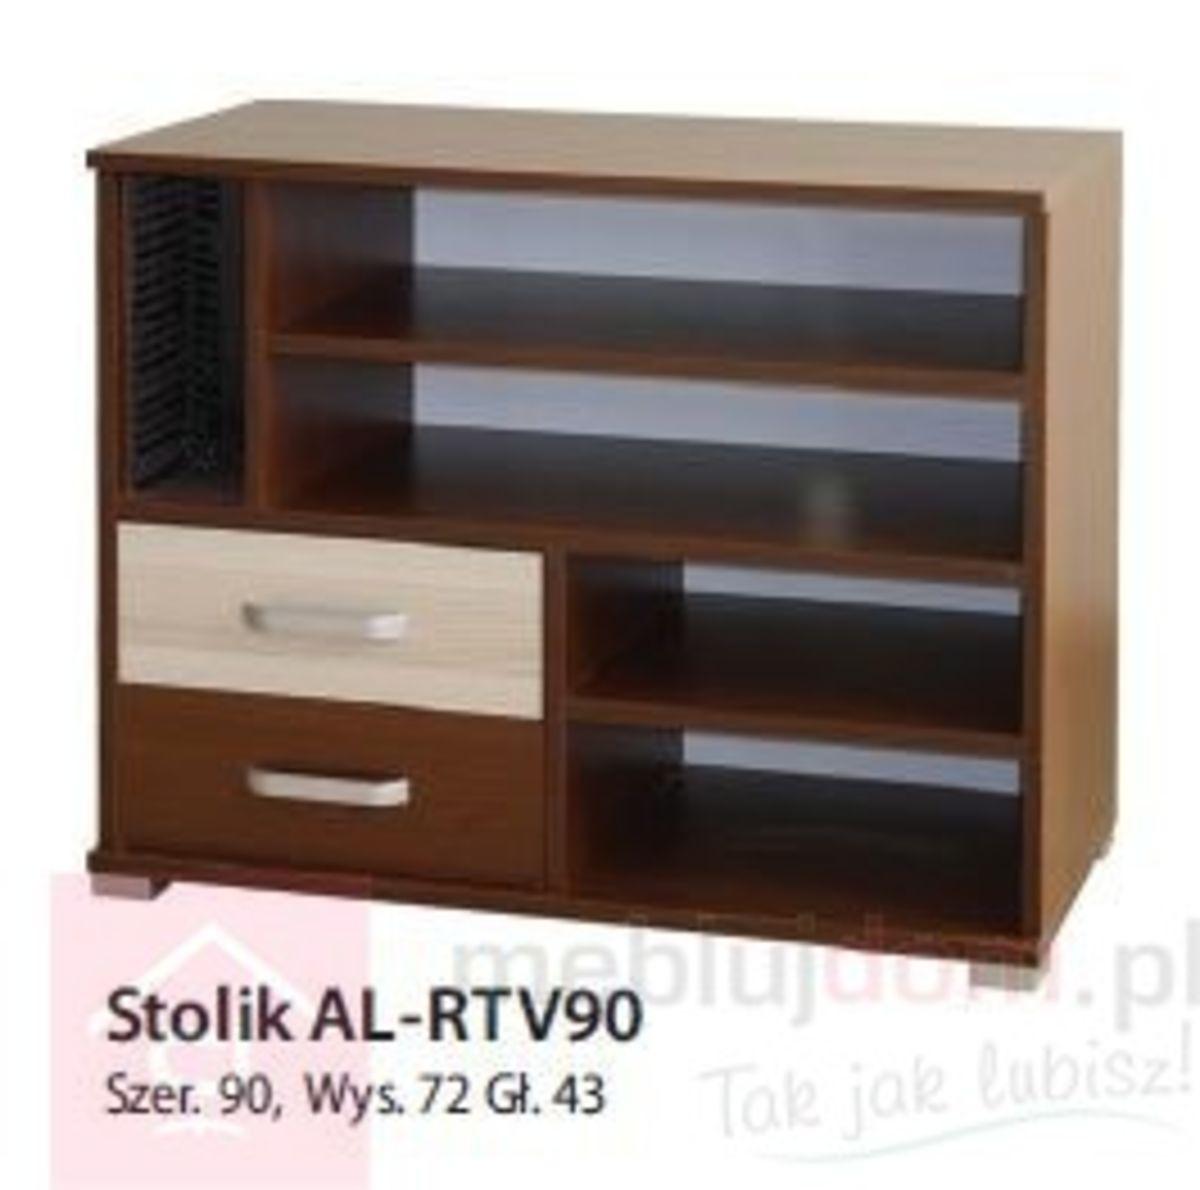 Szafka RTV ALASKA AL-RTV 90